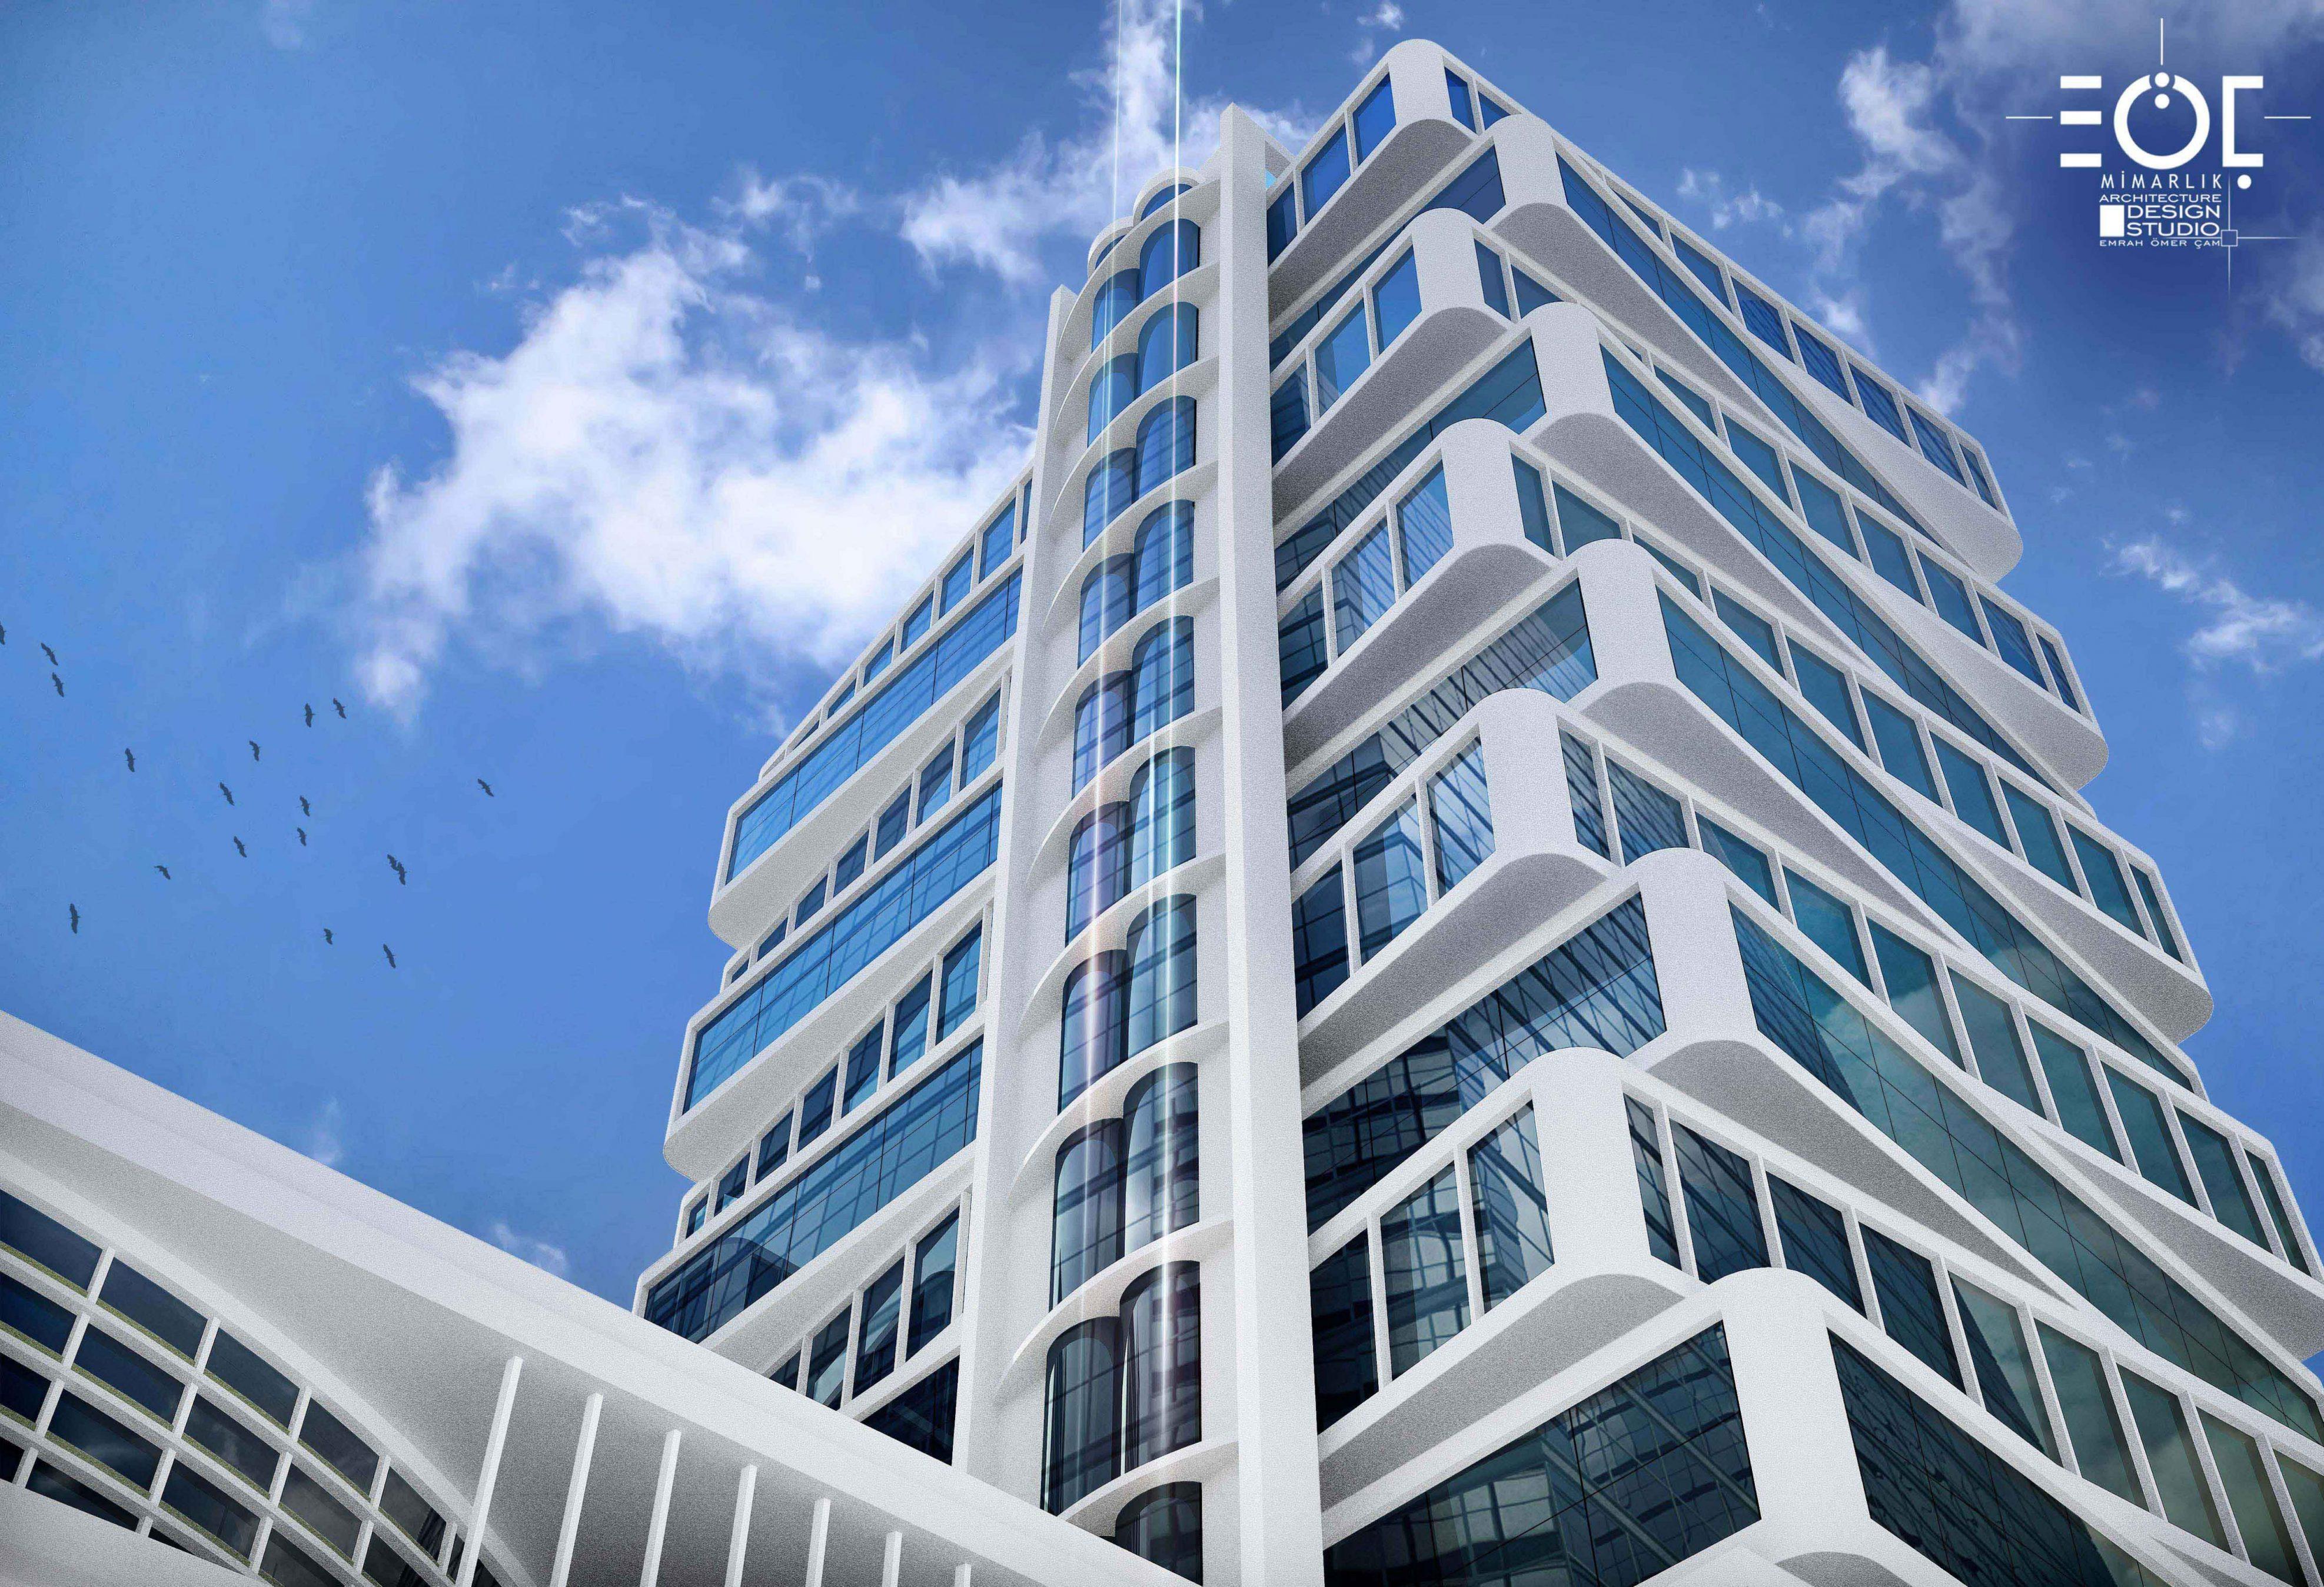 Anadolu Birlik Holding Service Building